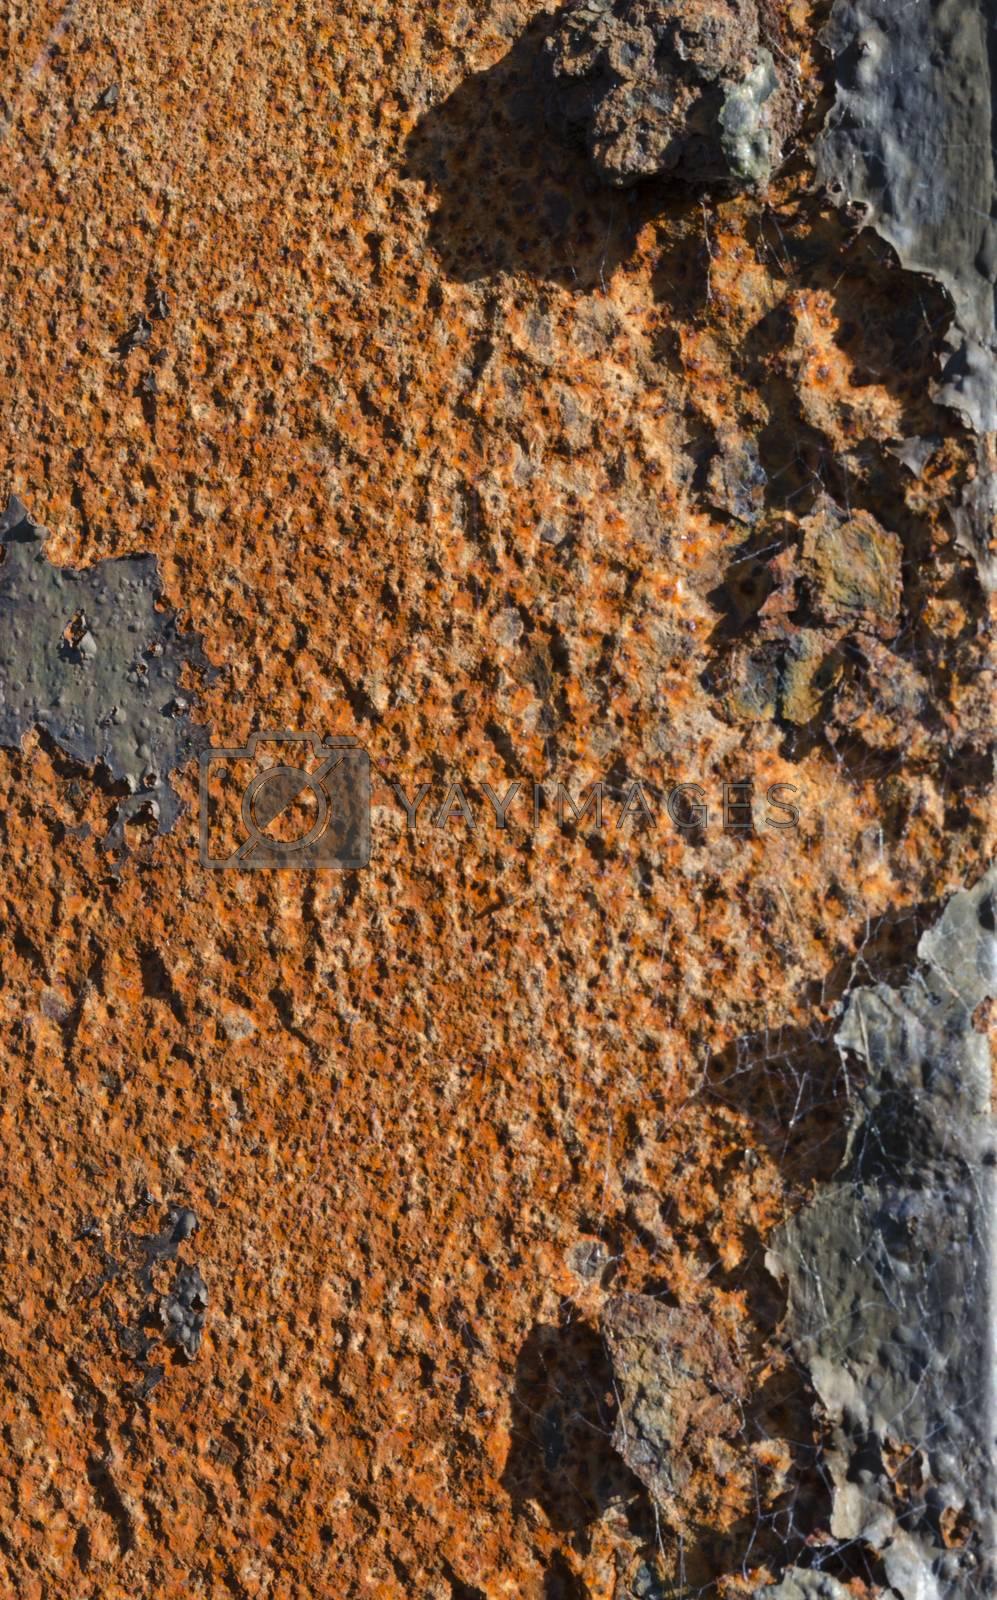 Royalty free image of Rusty metalwork by JohnDavidPhoto